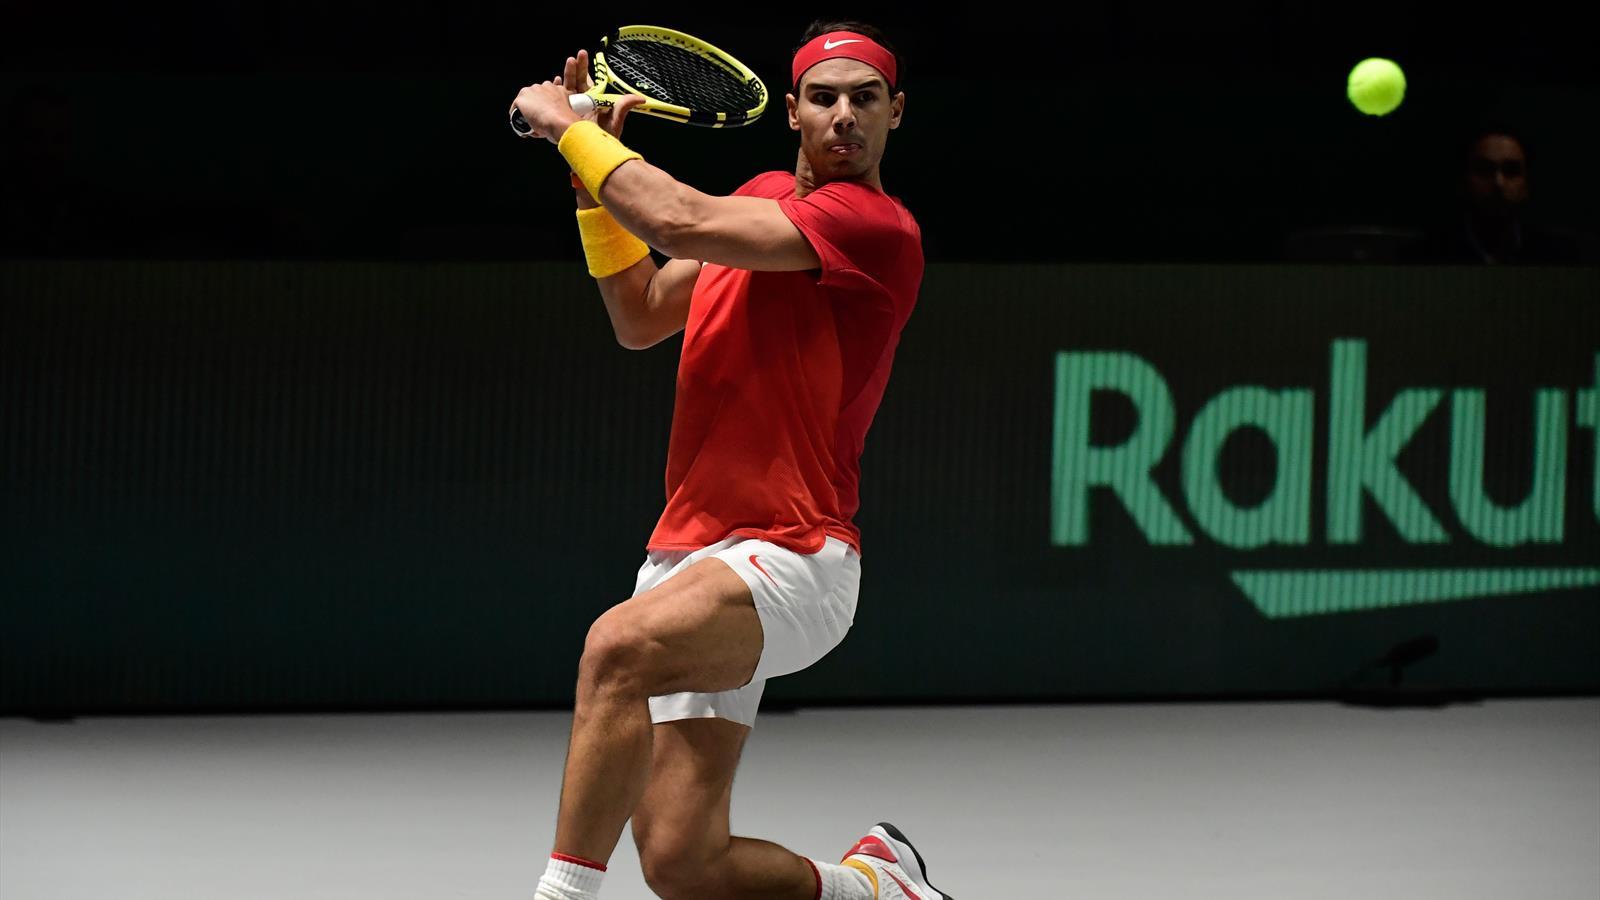 Davis Cup Ergebnisse Live